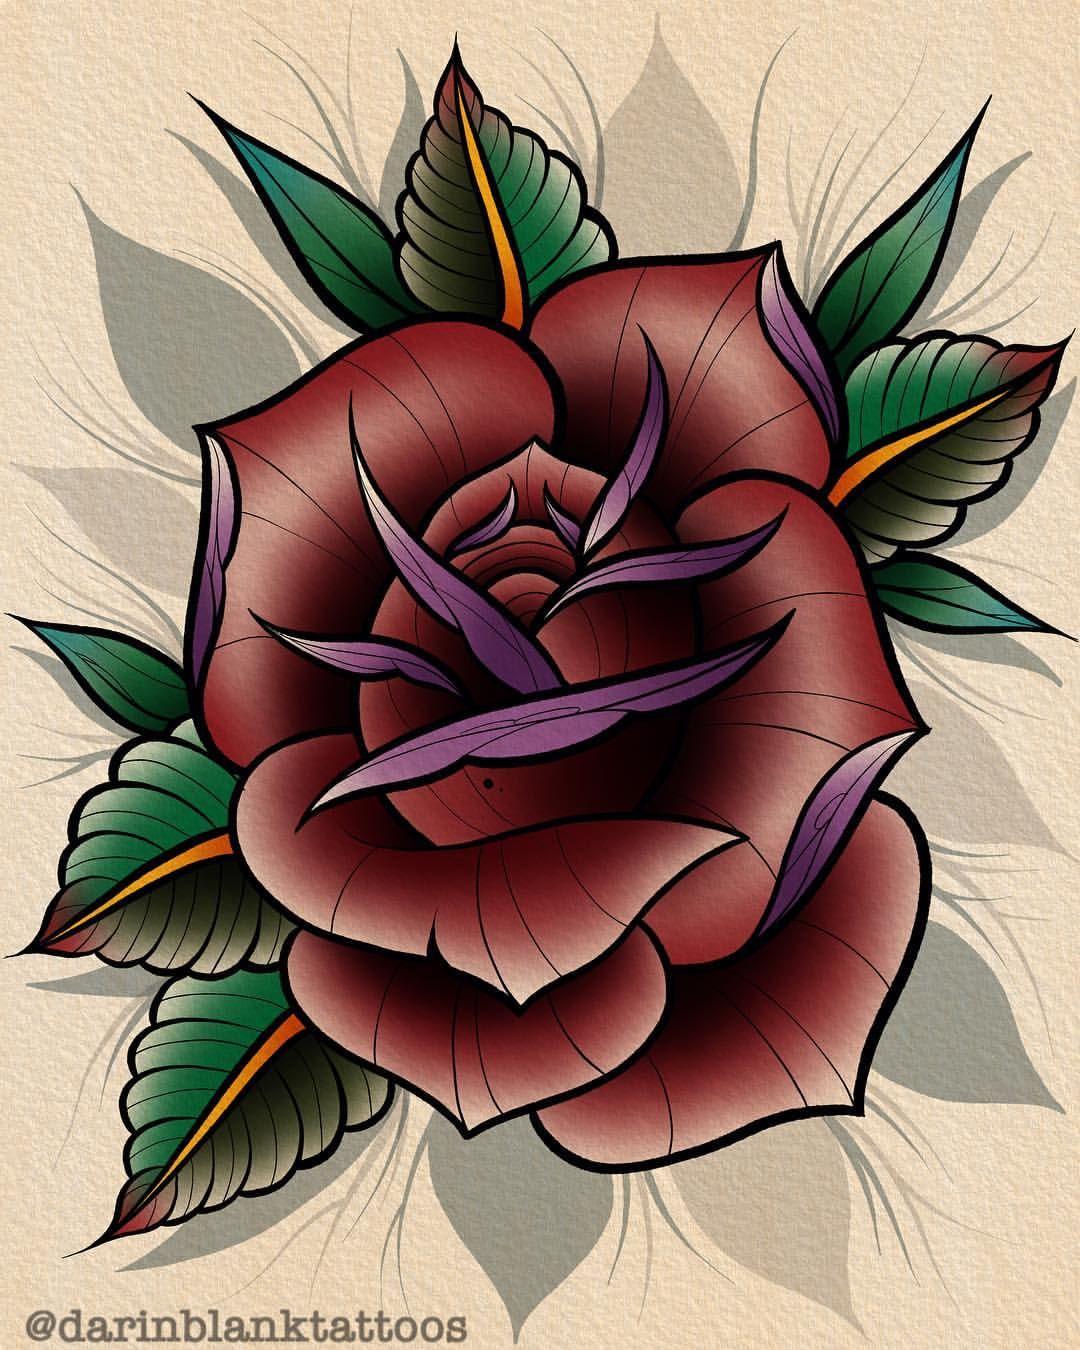 Red Rose On This Freezing Cold Thursday Tattoo Tattoos Tattooed Tattooart Tattoo Traditional Tattoo Flowers Floral Tattoo Sleeve Rose Neck Tattoo